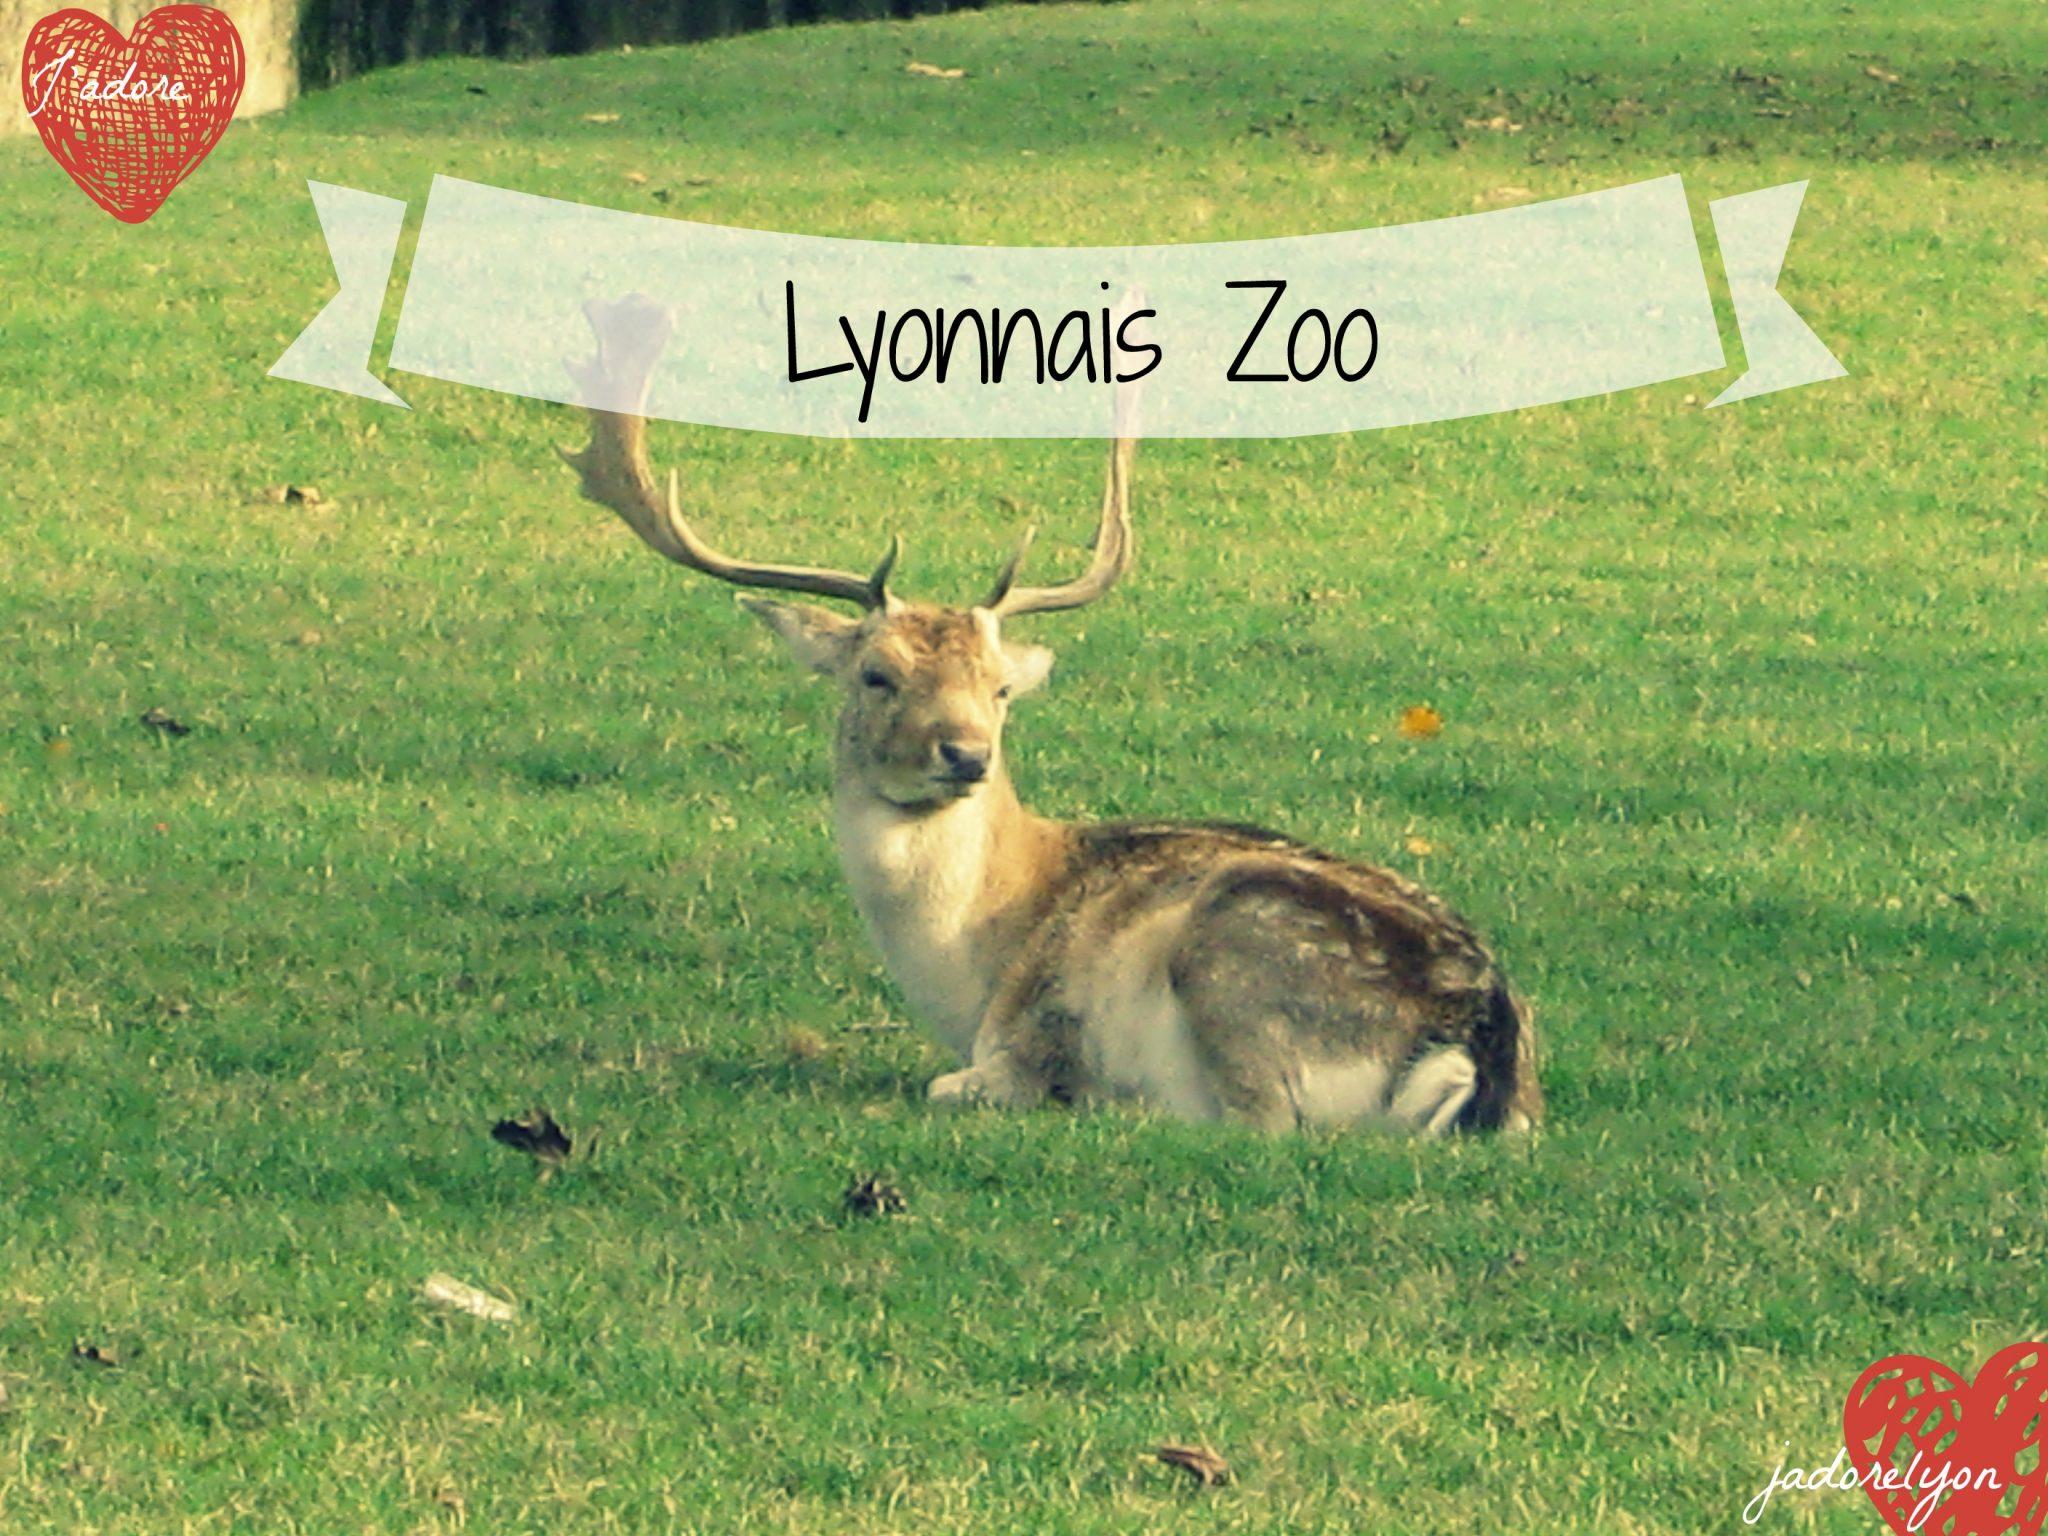 Lyonnais Zoo